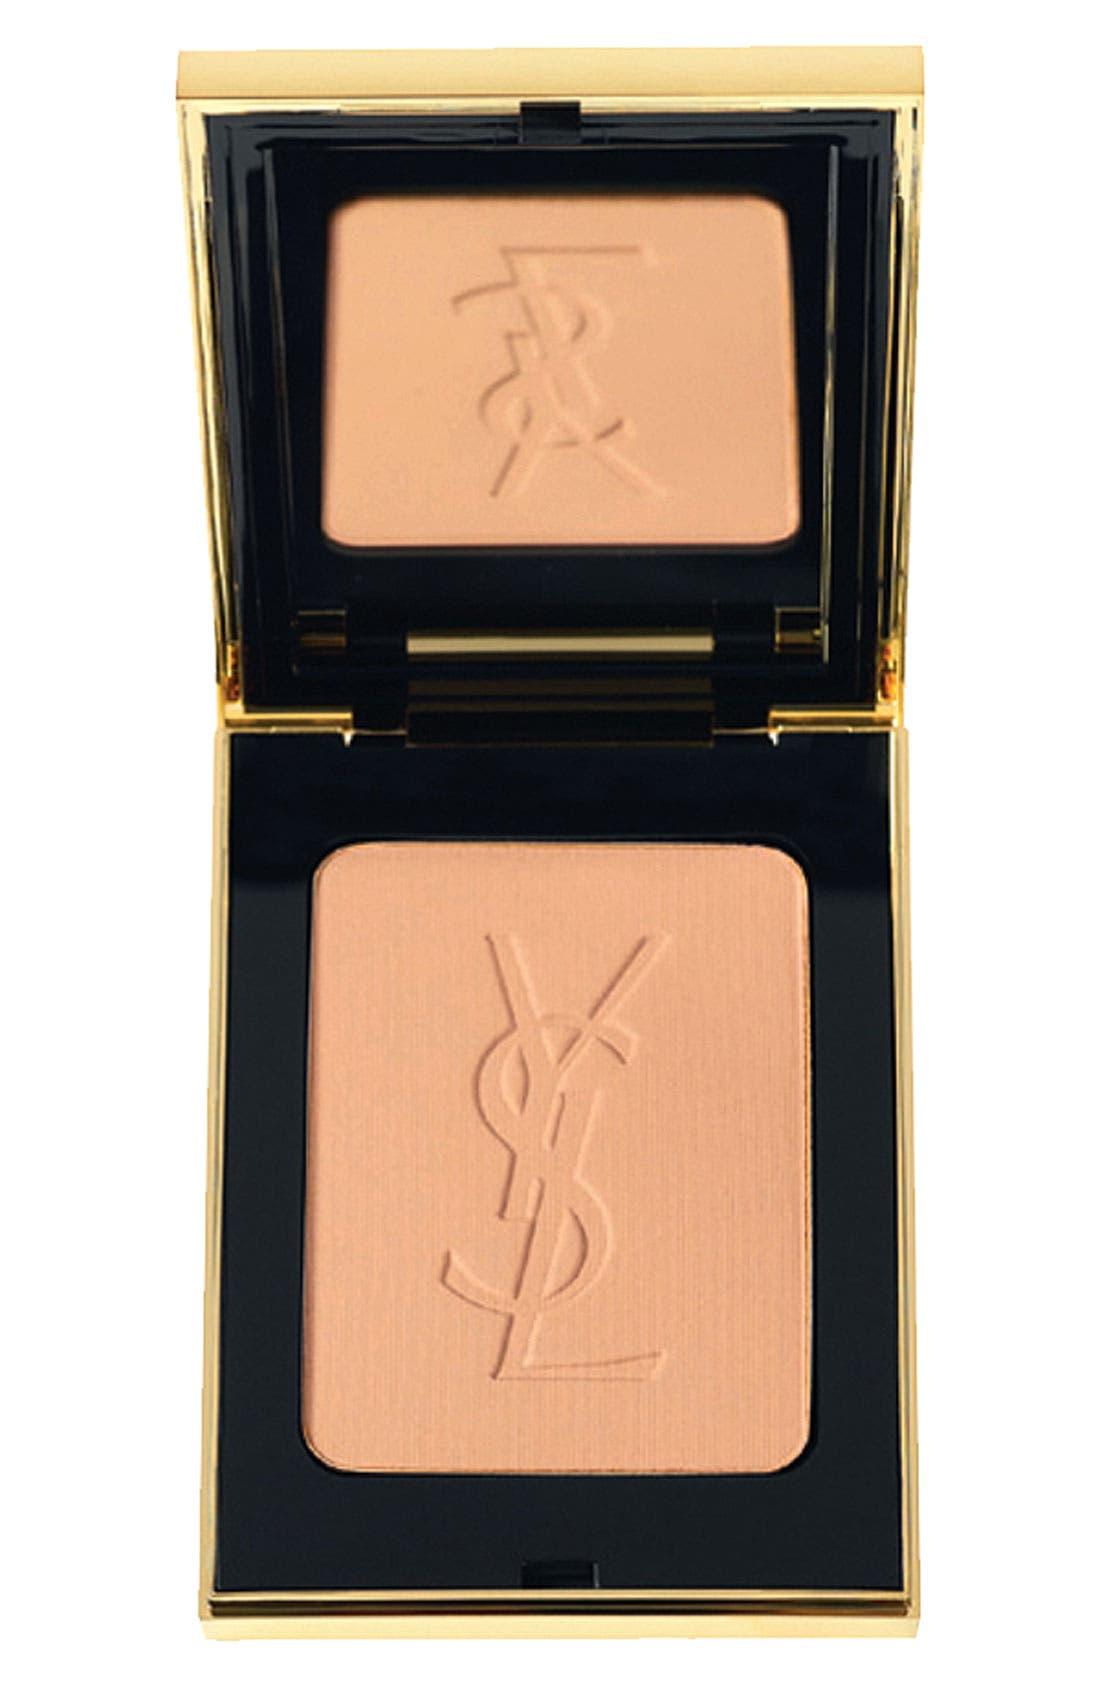 Yves Saint Laurent Radiant Pressed Powder Compact